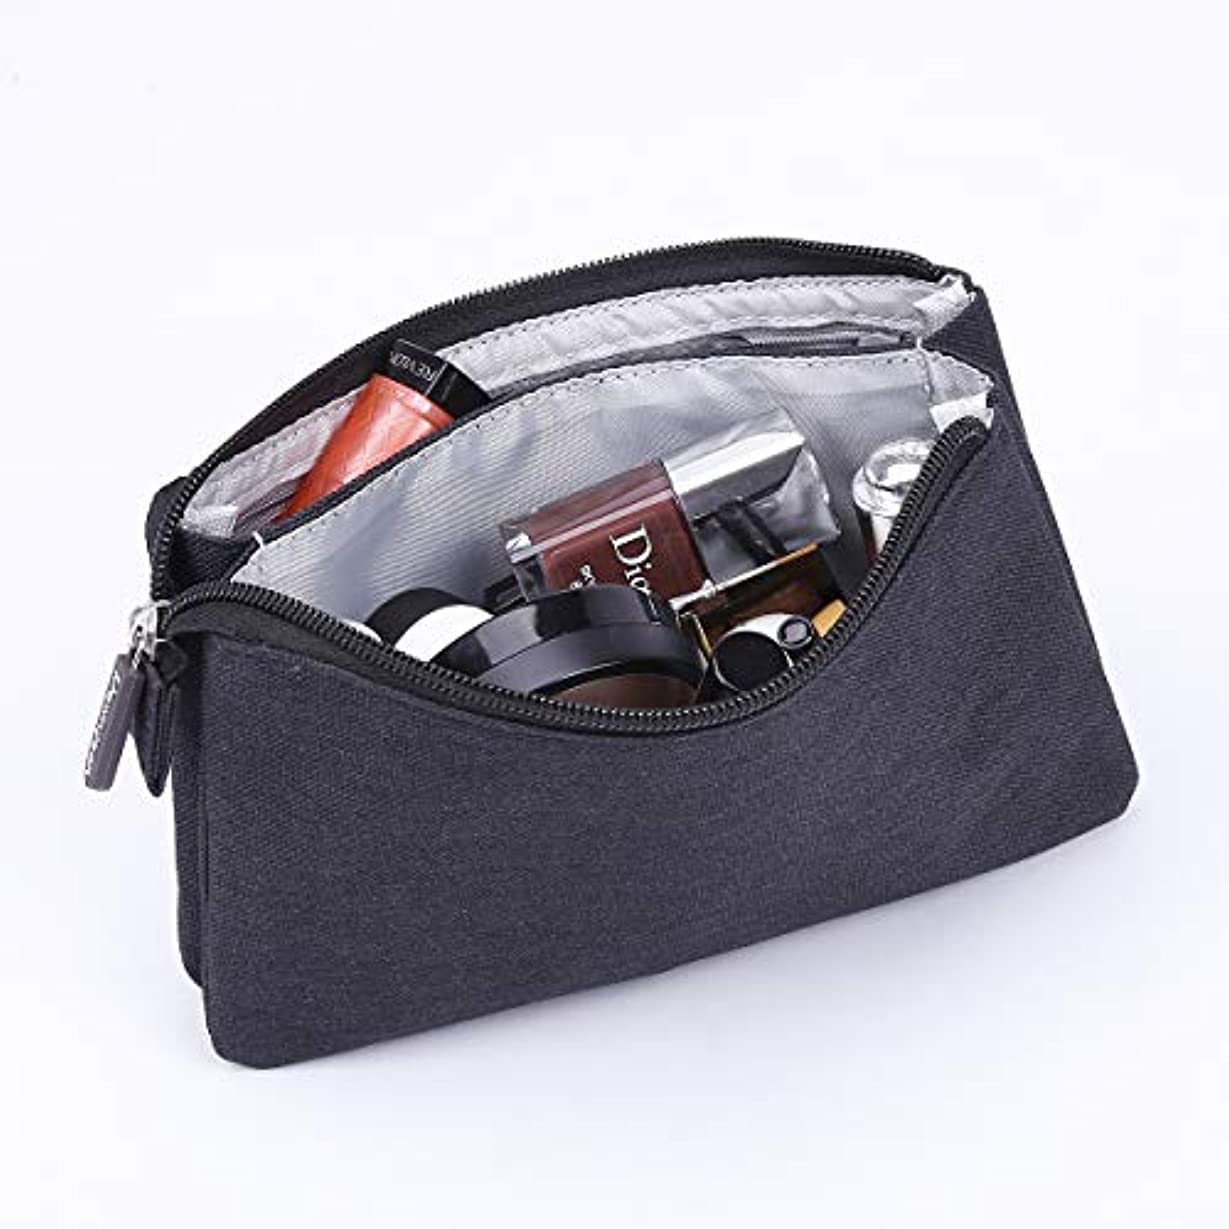 Rownyeon 化粧ポーチ メイクポーチ クラッチバッグ 小型 財布 インナー コスメポーチ 大容量 機能的 小物入れ シンプル 小物ケース 携帯用 普段使い 人気